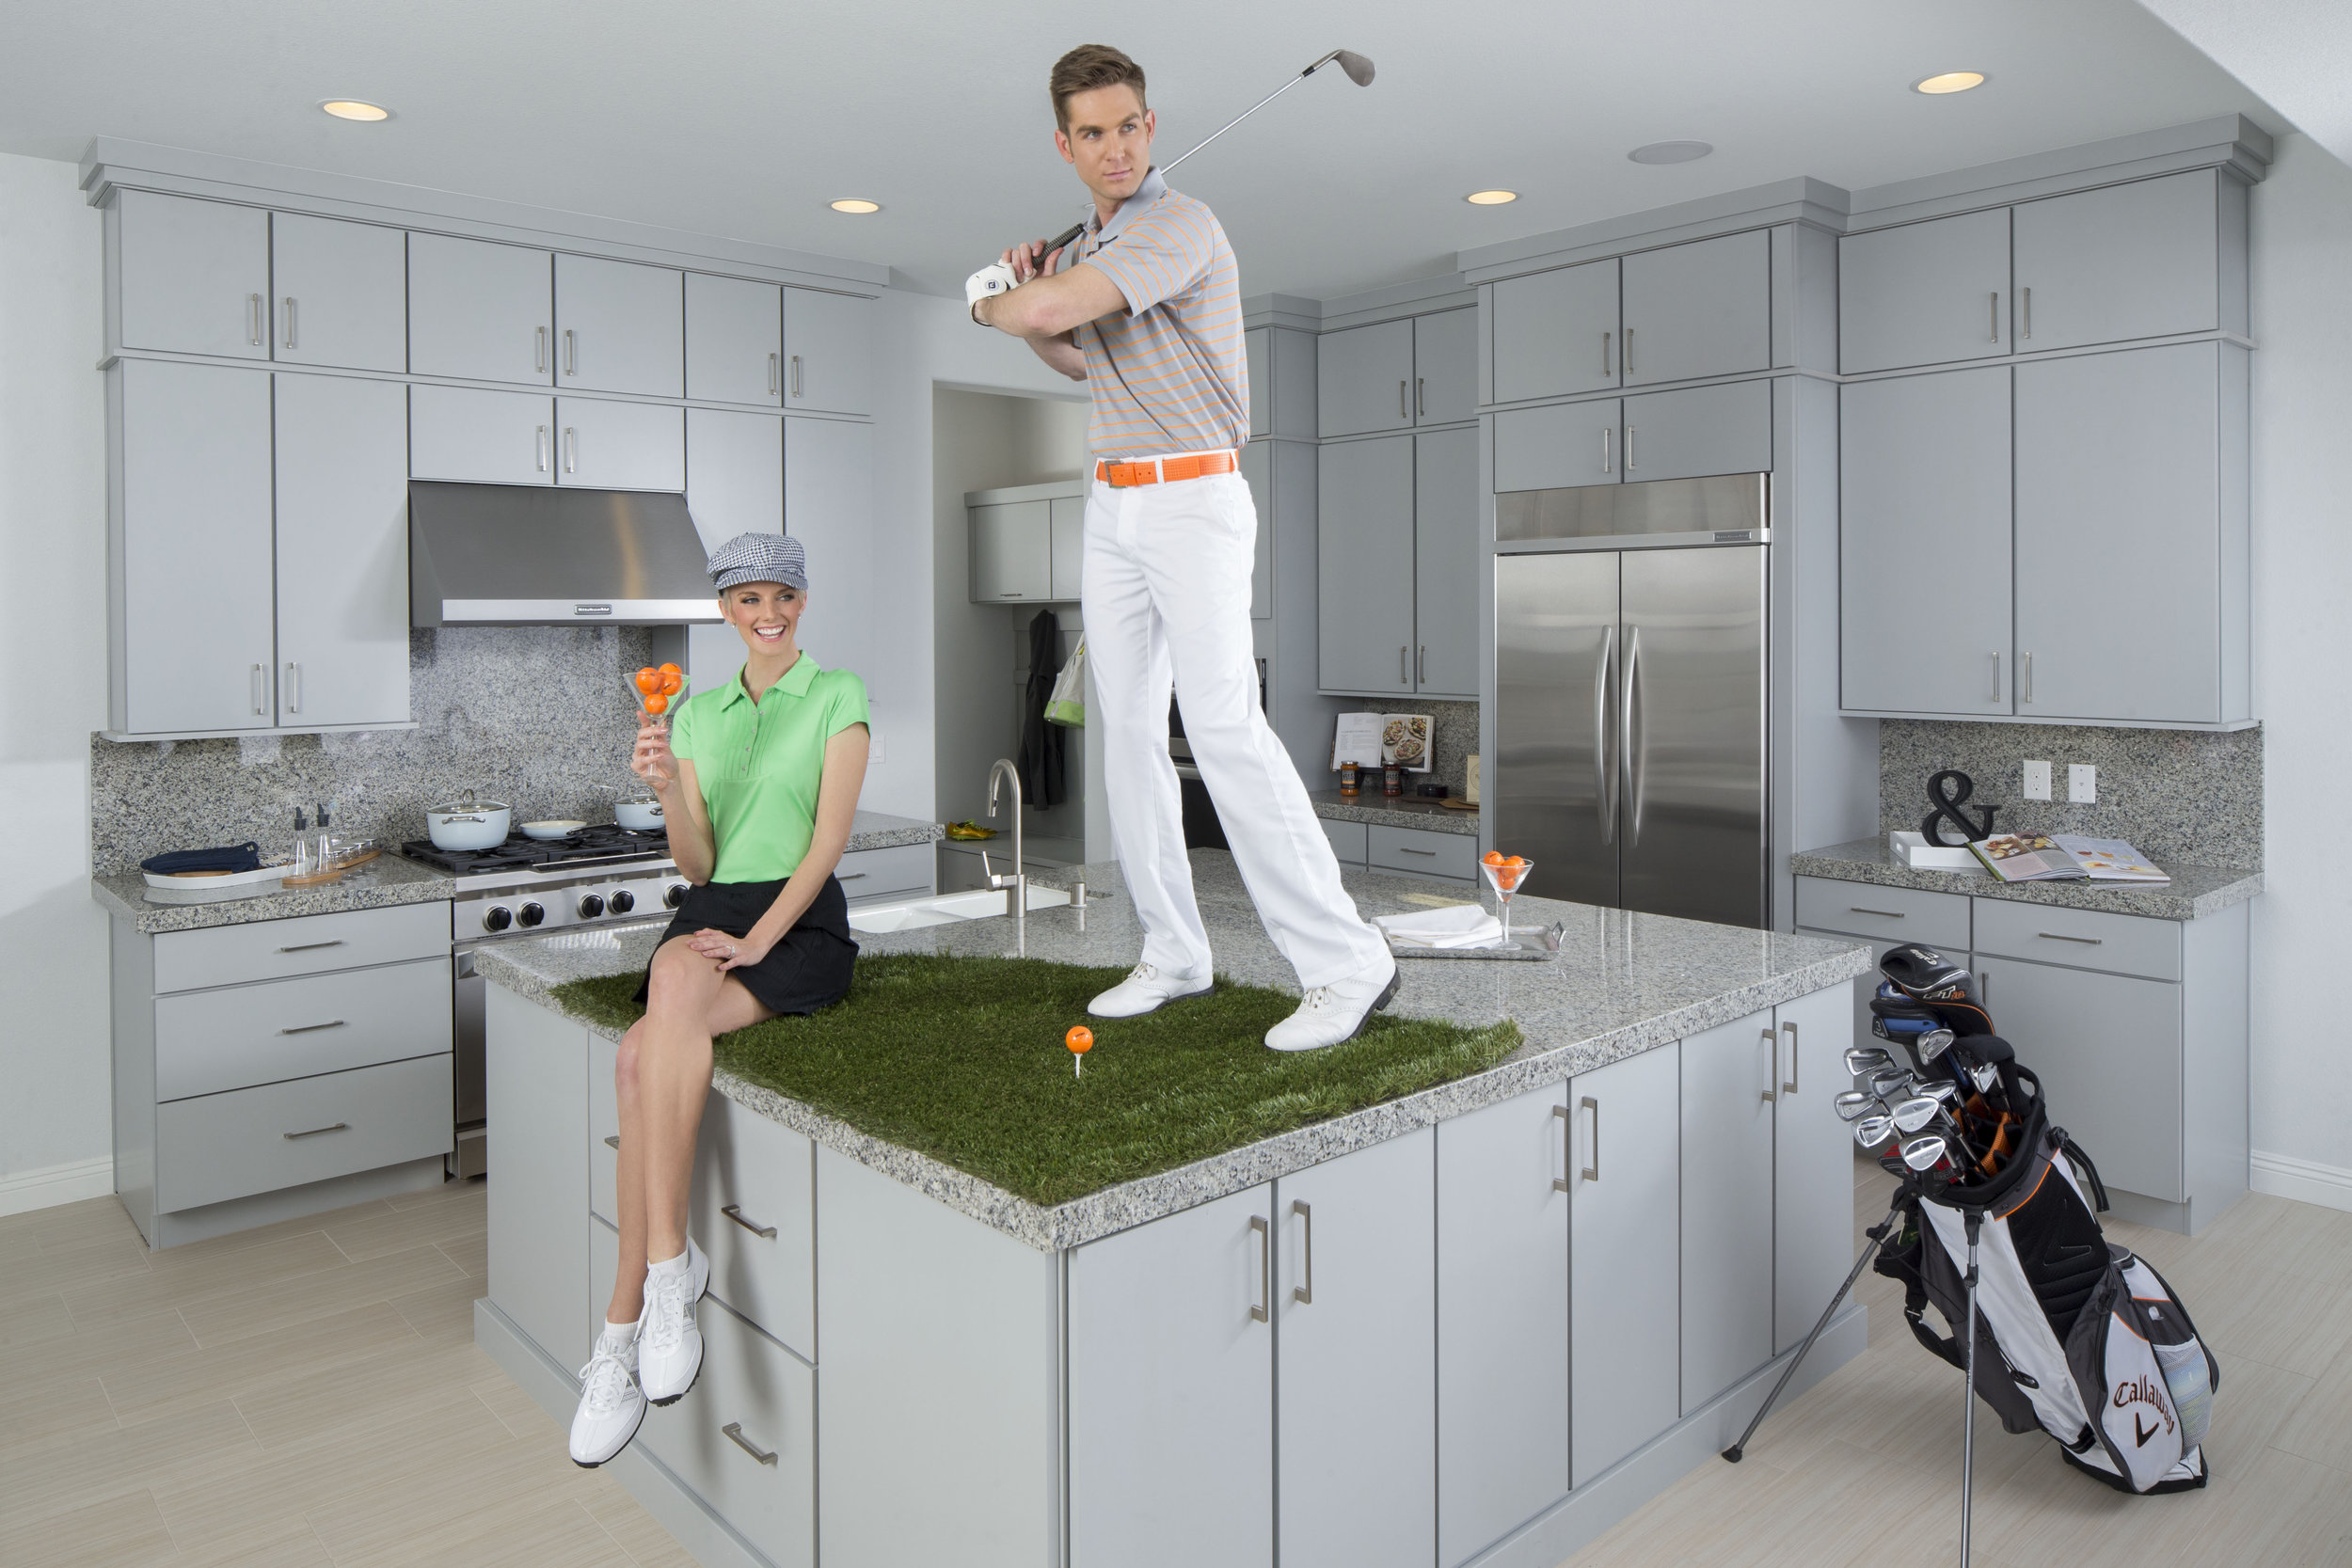 westelm_Golfer_ad.jpg